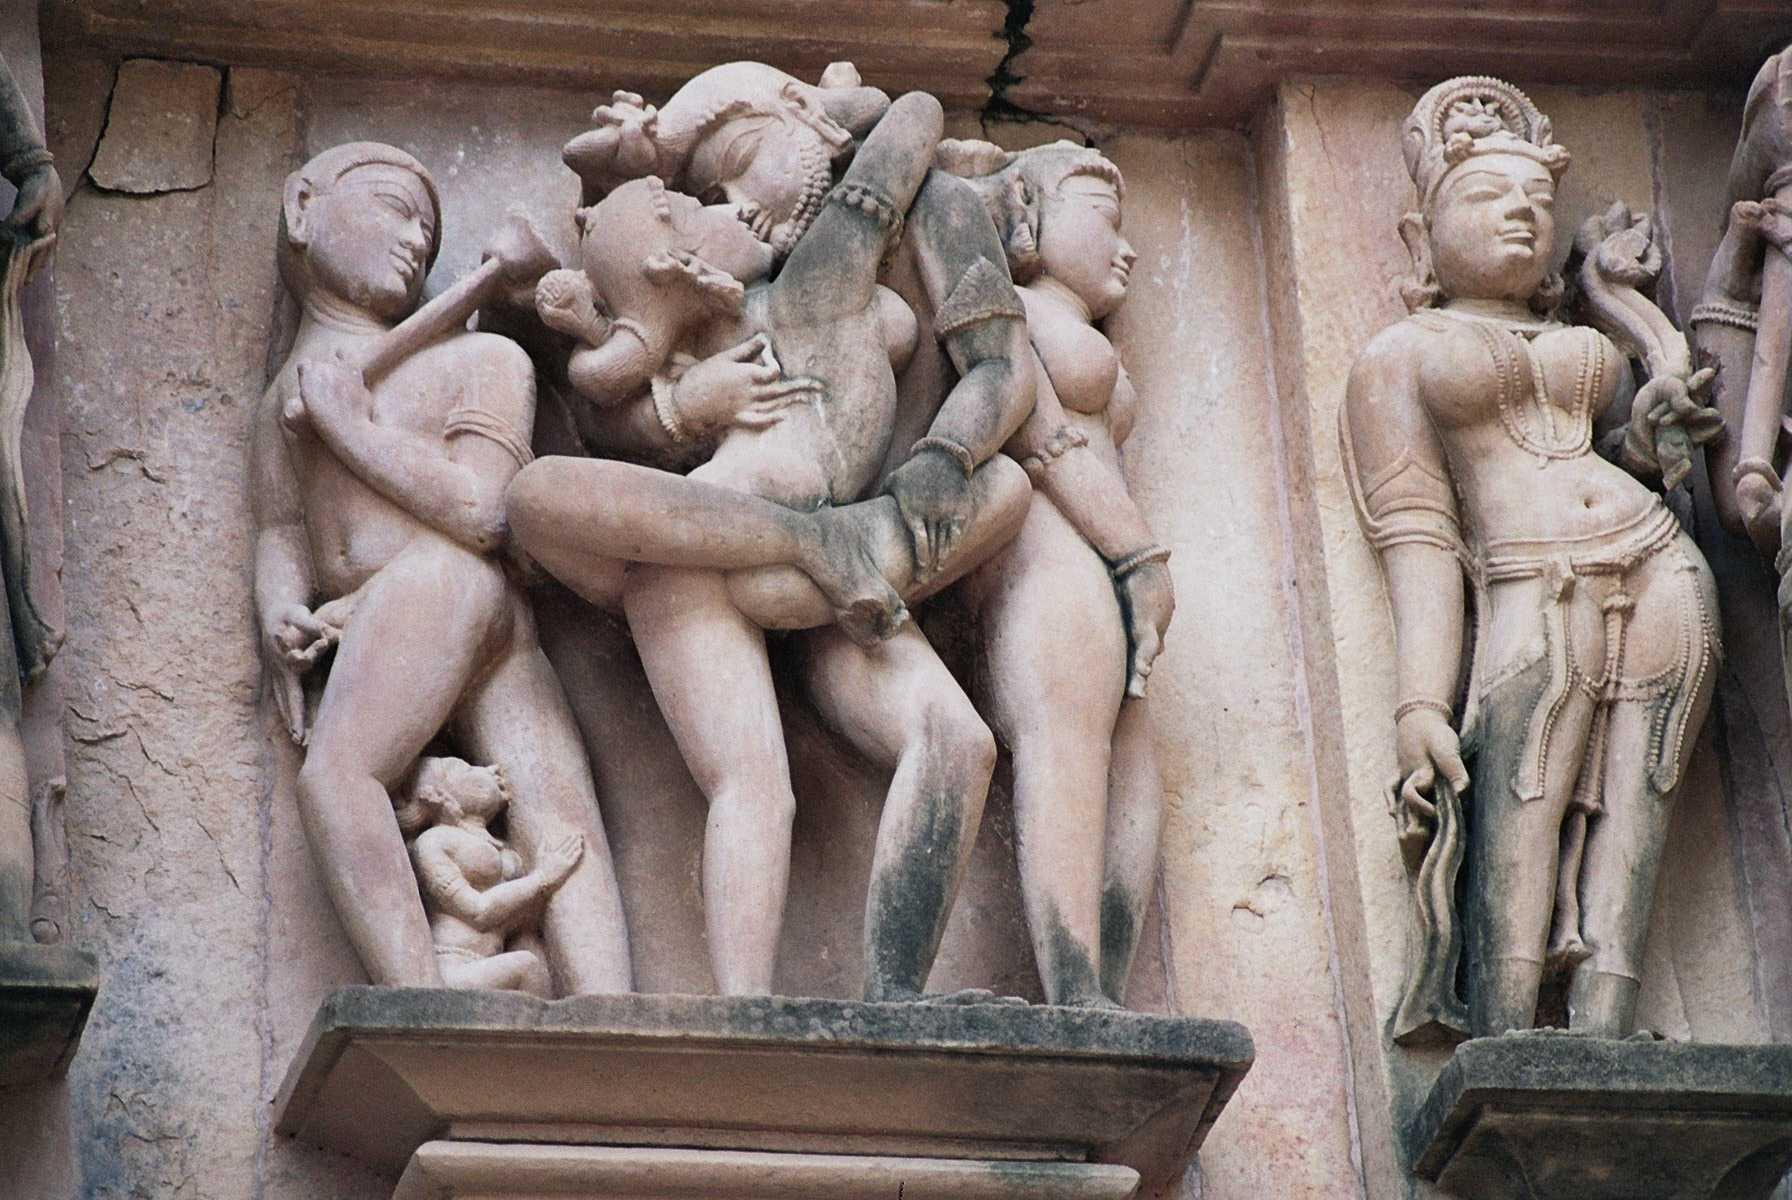 La historia del sexo extramatrimonial